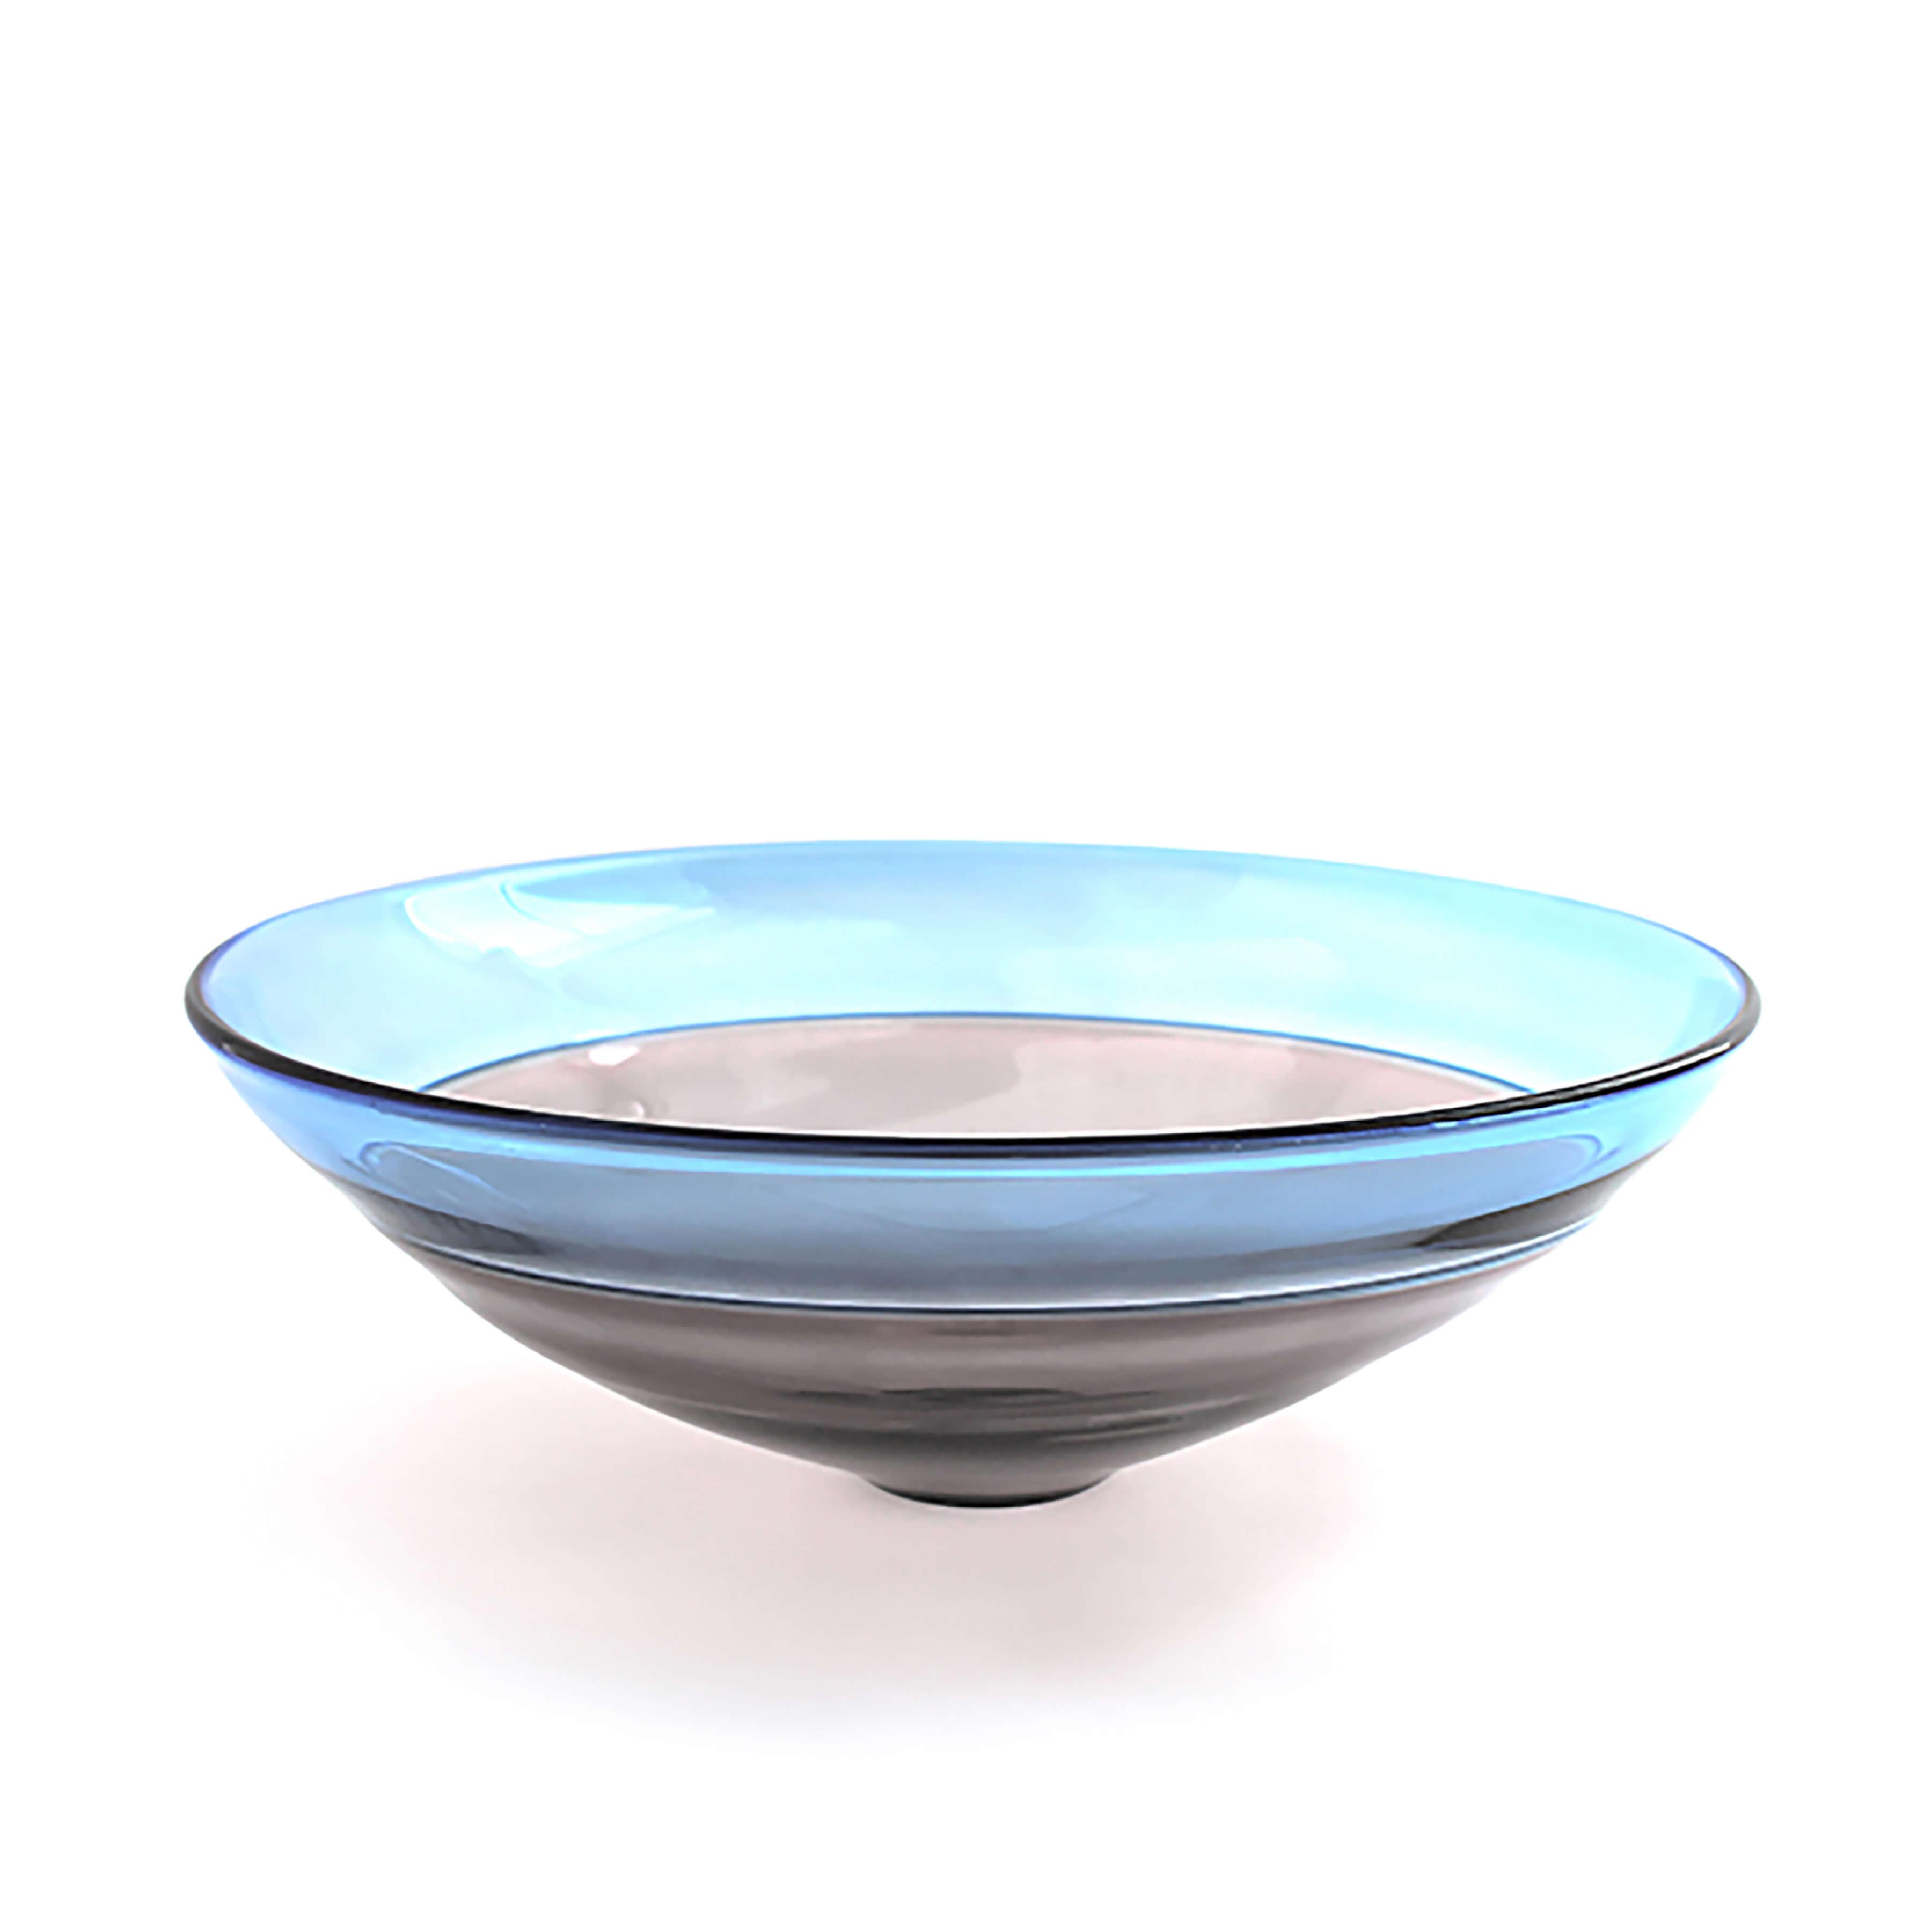 Catskill Glasswork: Chad Davis, upstate New York, ny glass art, baskets, bowls